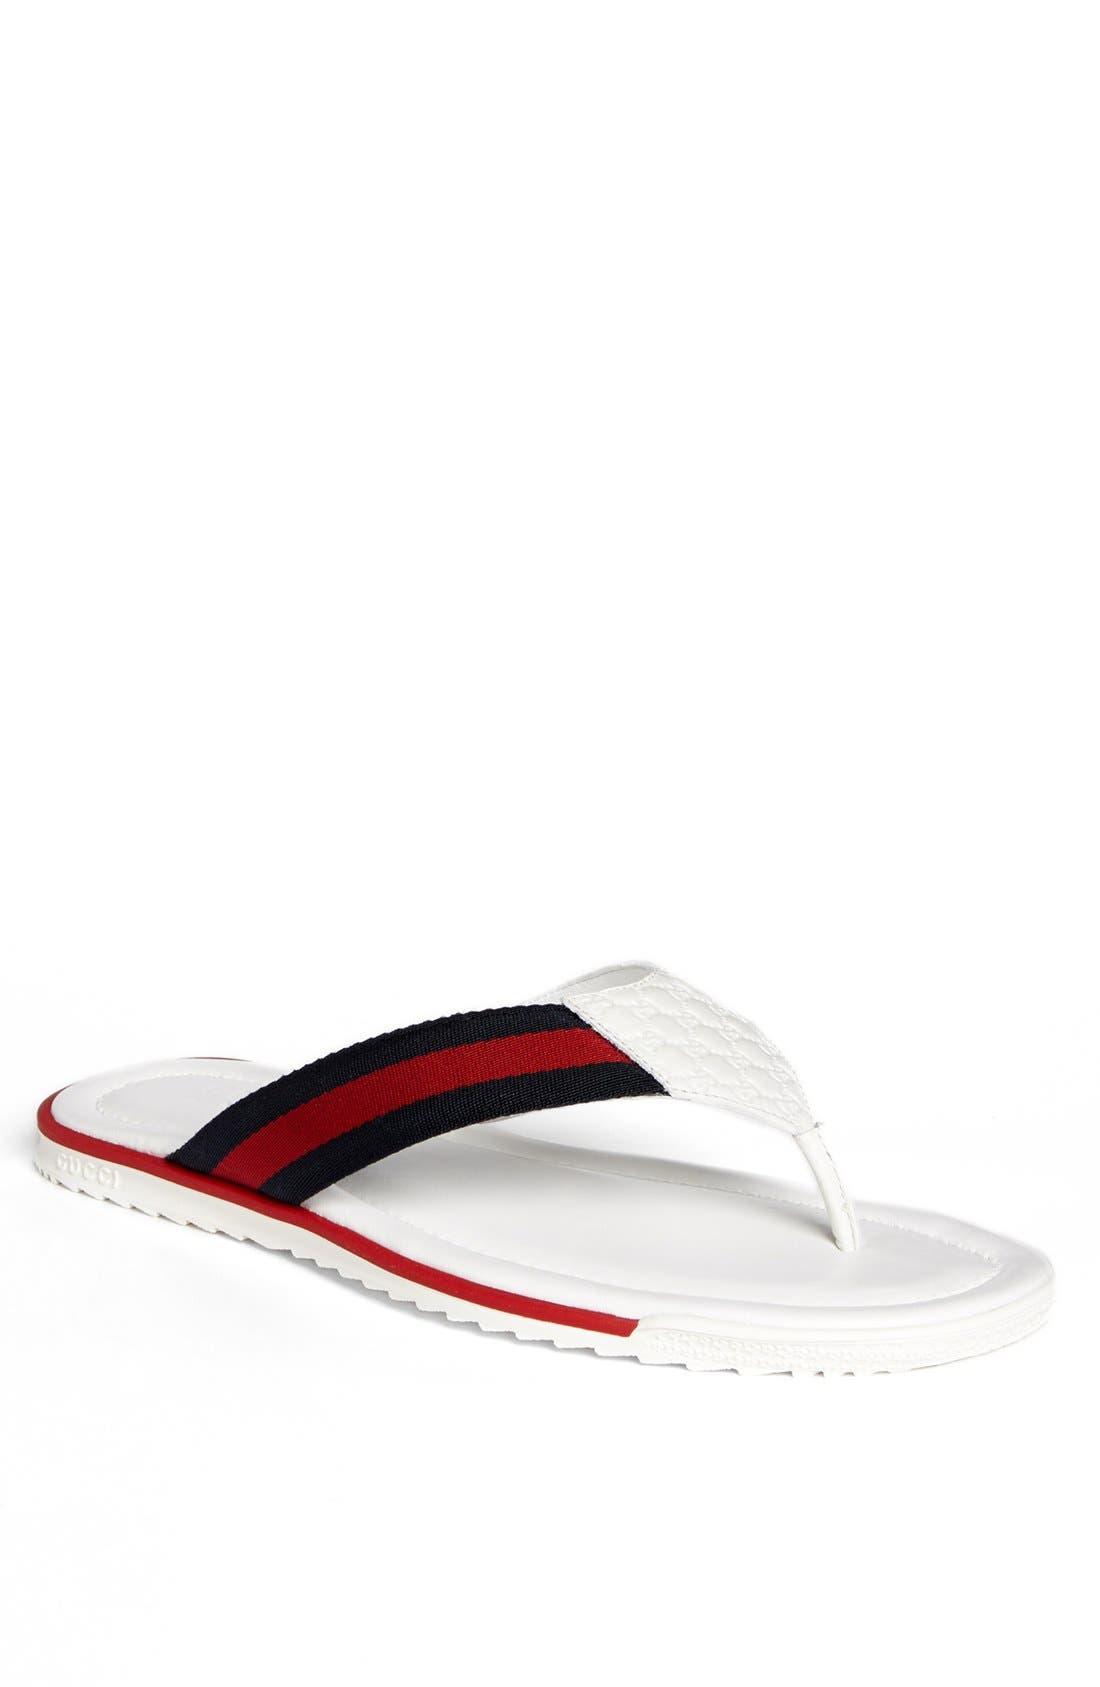 Main Image - Gucci 'SL 73 Beach' Flip Flop